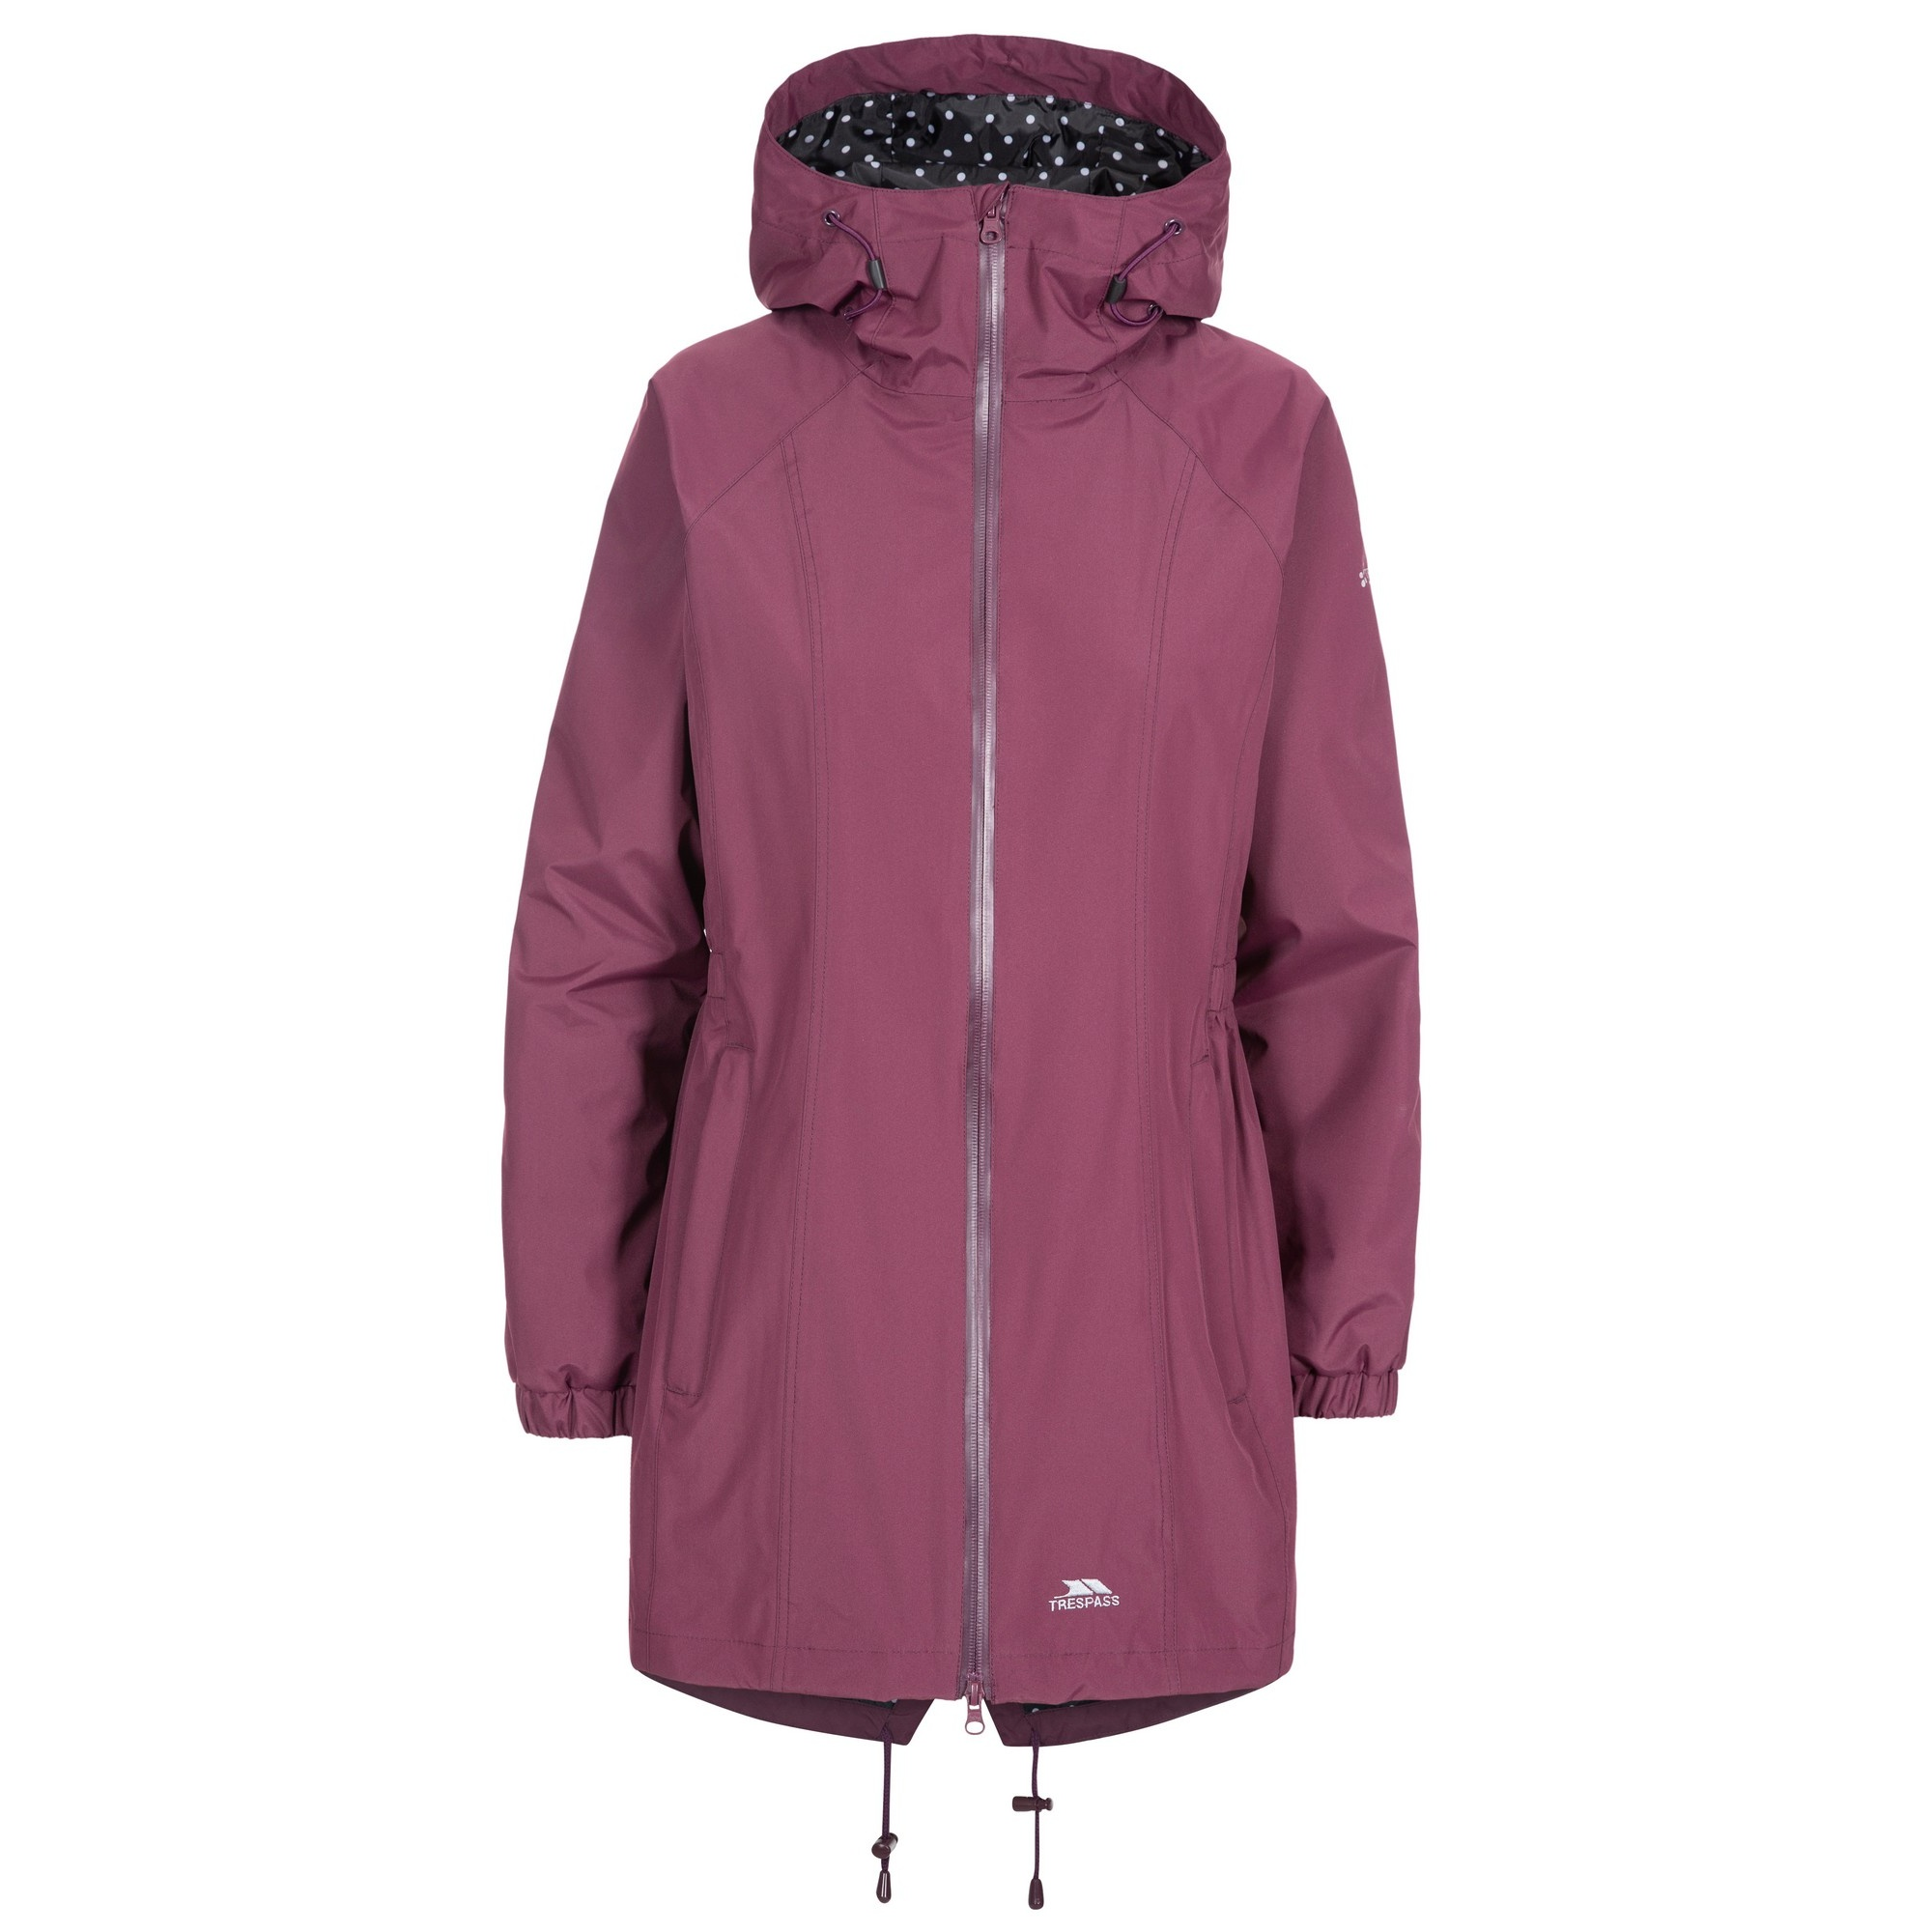 Trespass Womens/Ladies Waterproof Shell Jacket (XL) (Fig)